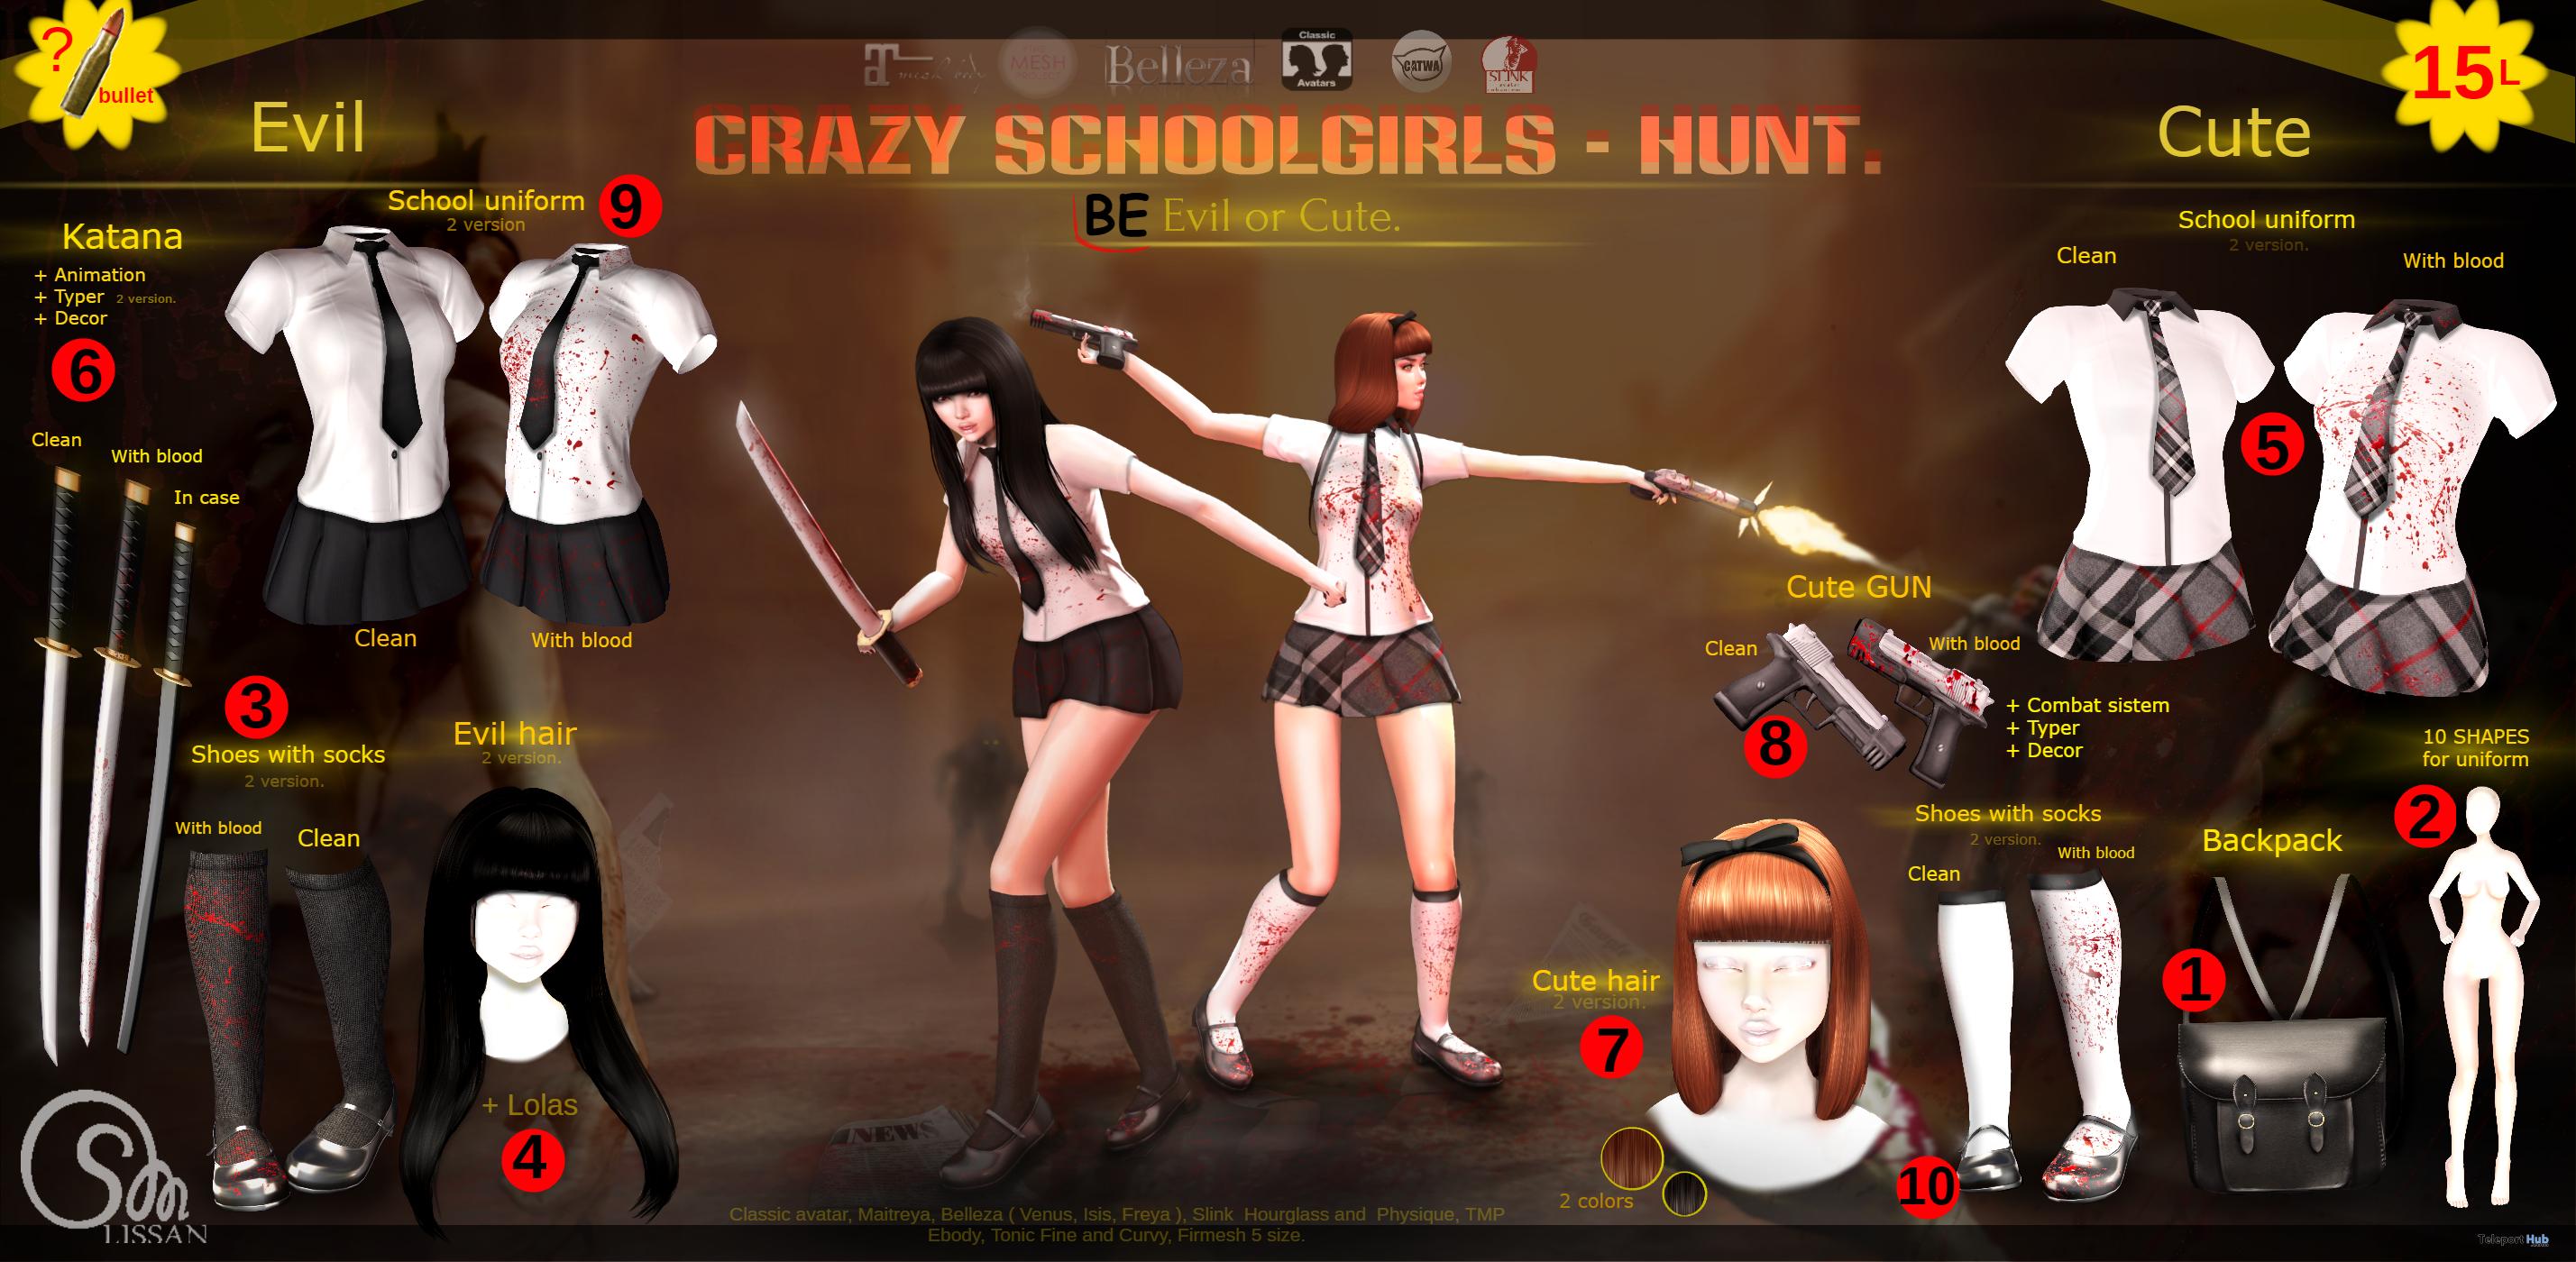 Crazy Schoolgirls Hunt - Teleport Hub - teleporthub.com